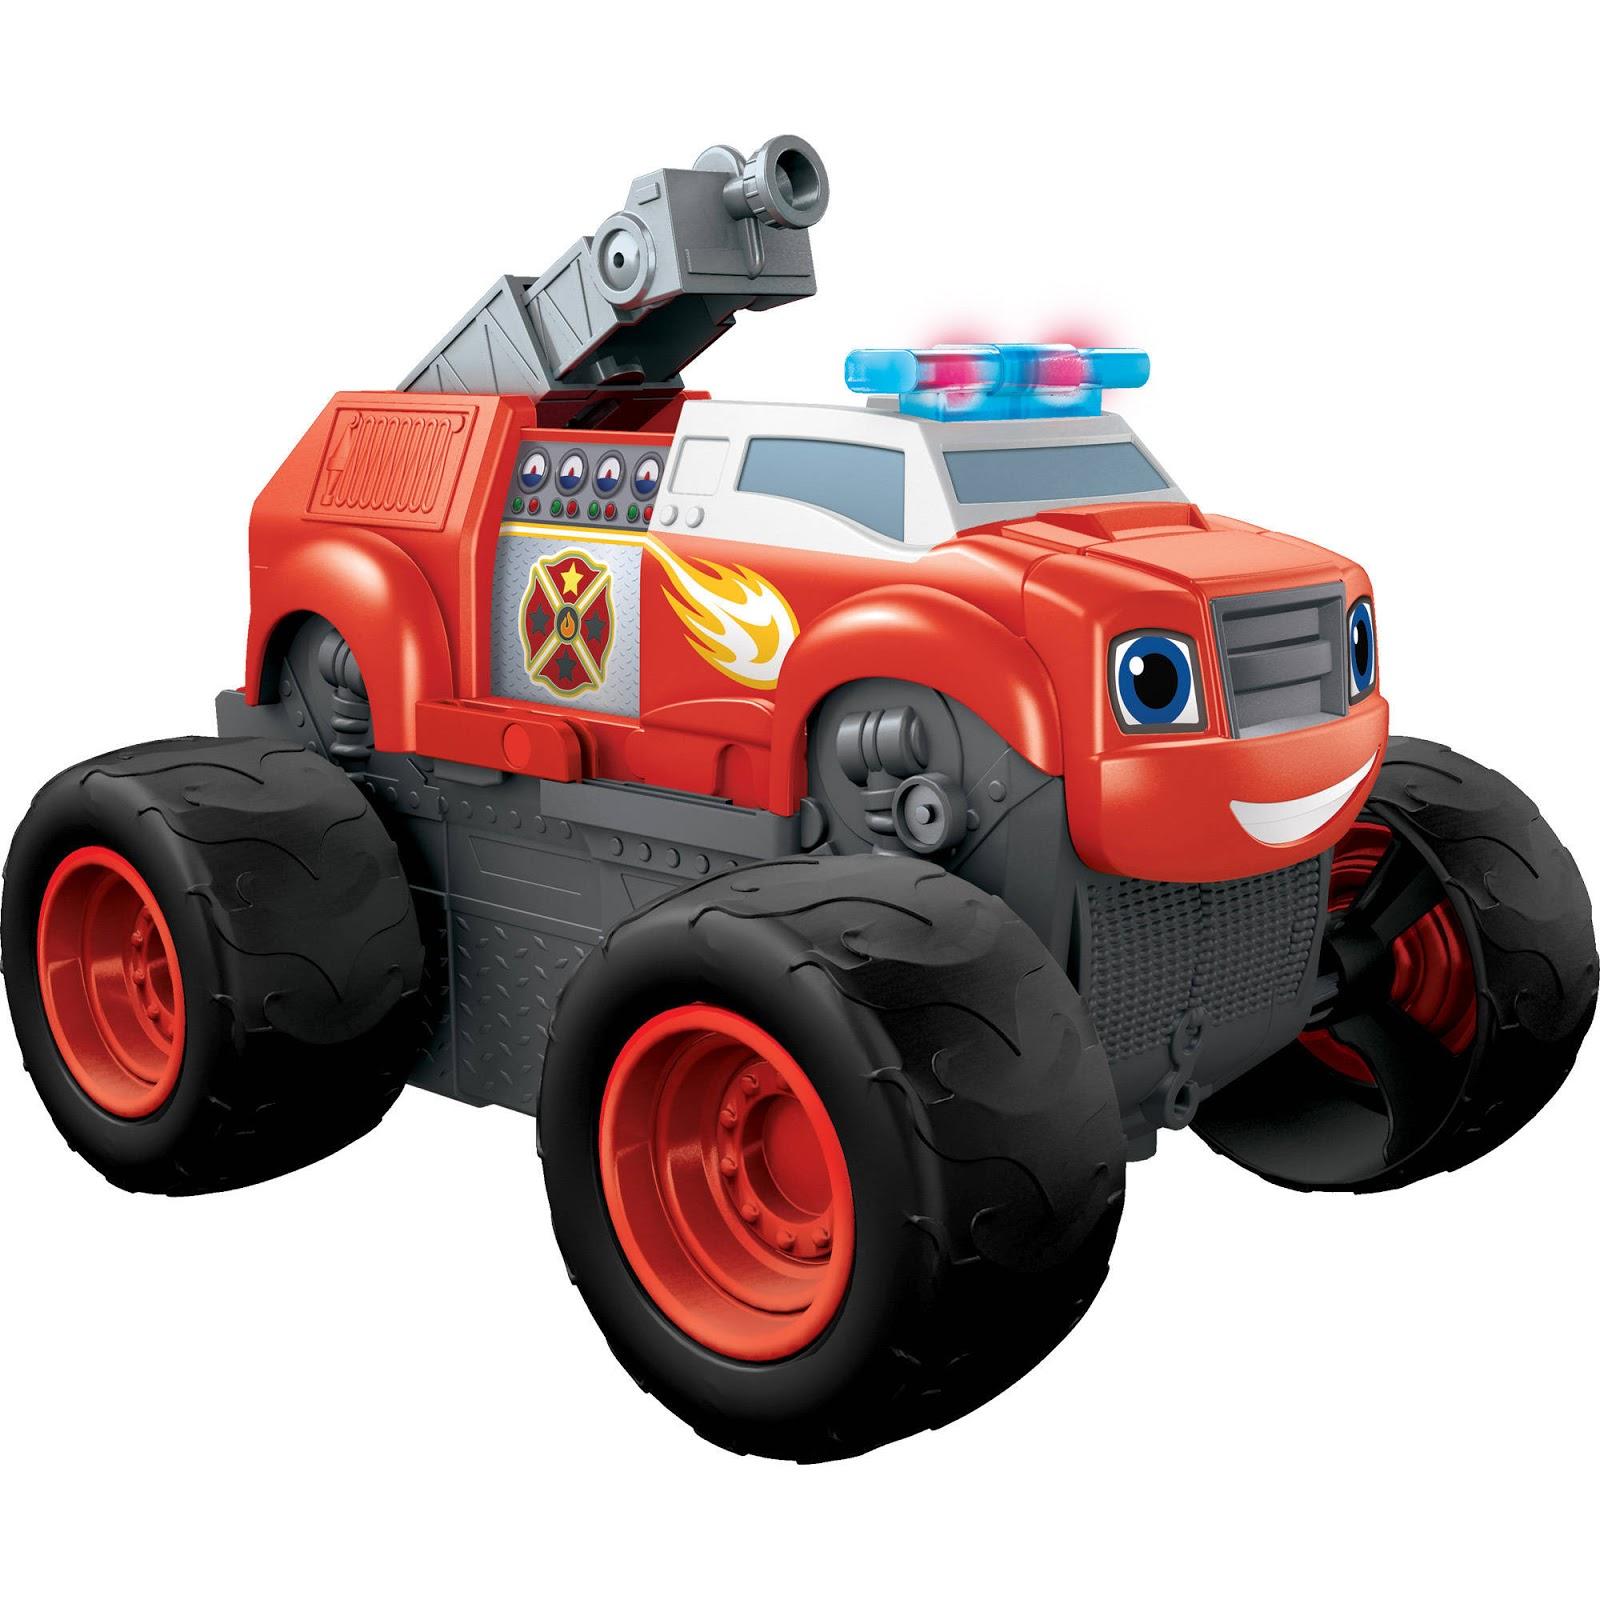 Nickelodeon Blaze Race Car Background Ogo